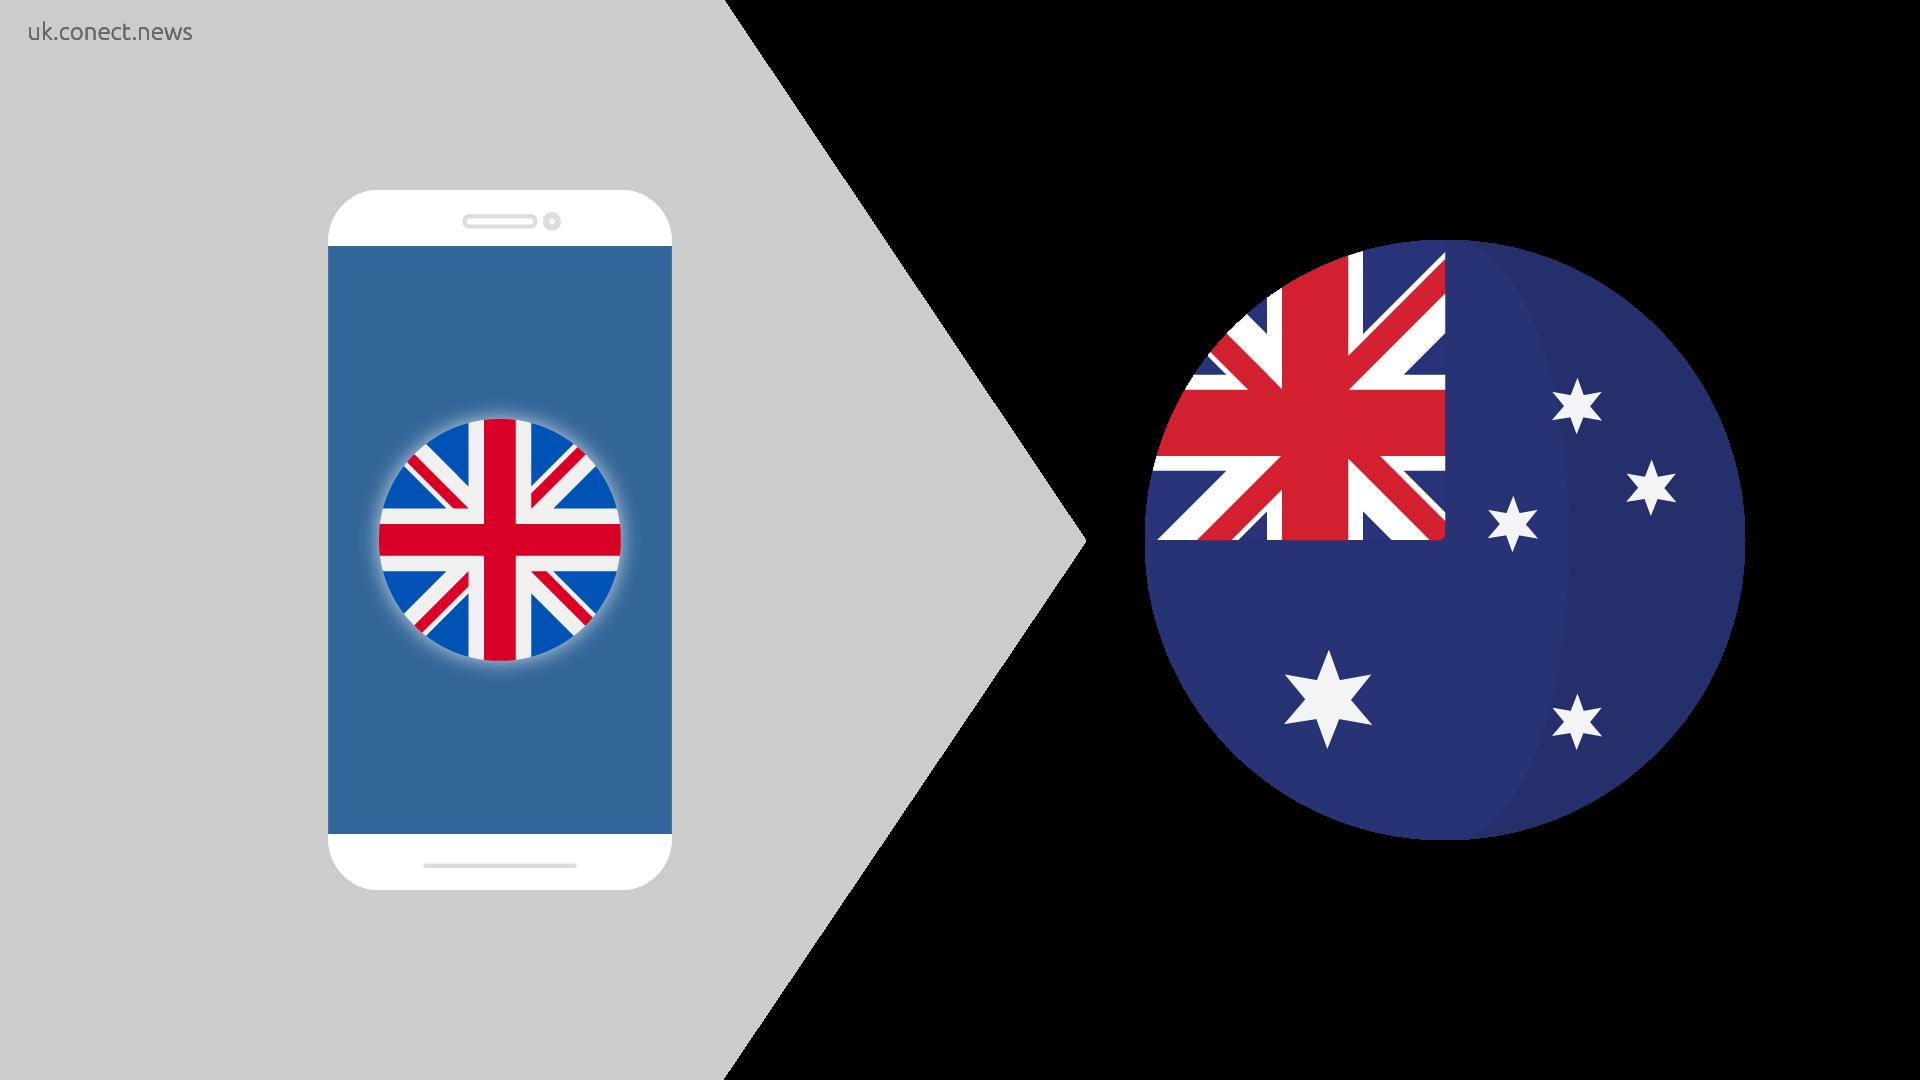 UK_Australia@conect_news